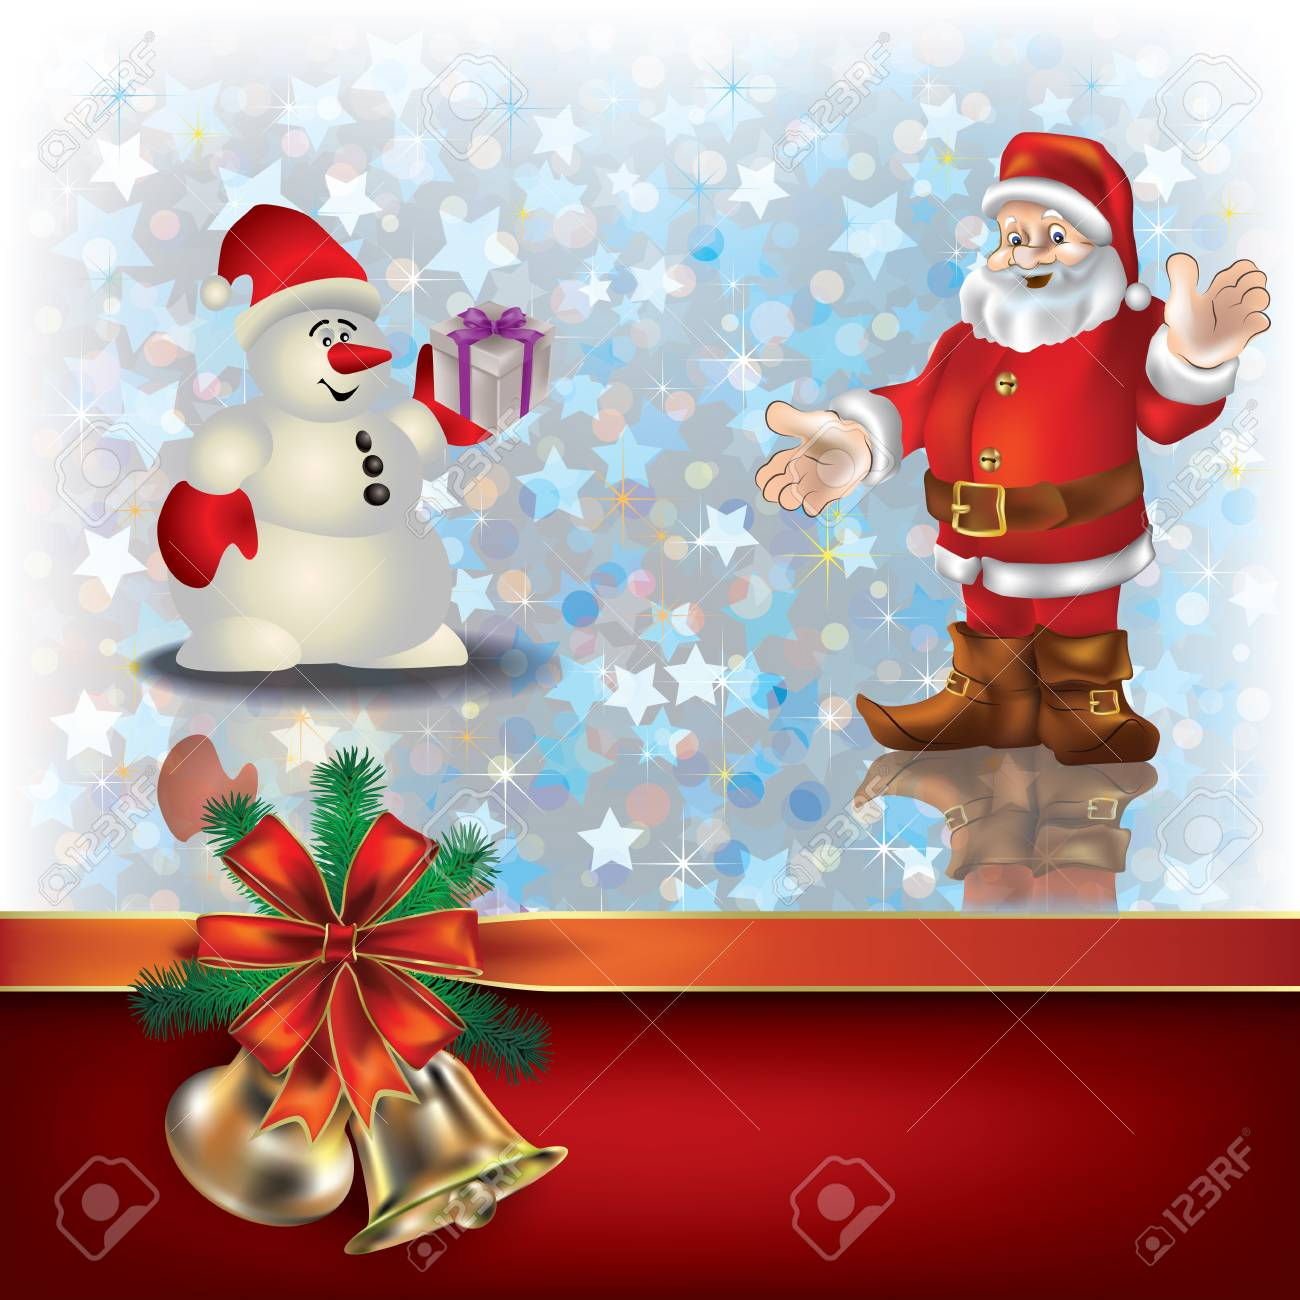 Abstract Christmas greeting with Santa Claus and gift ribbons Stock Vector - 10490106